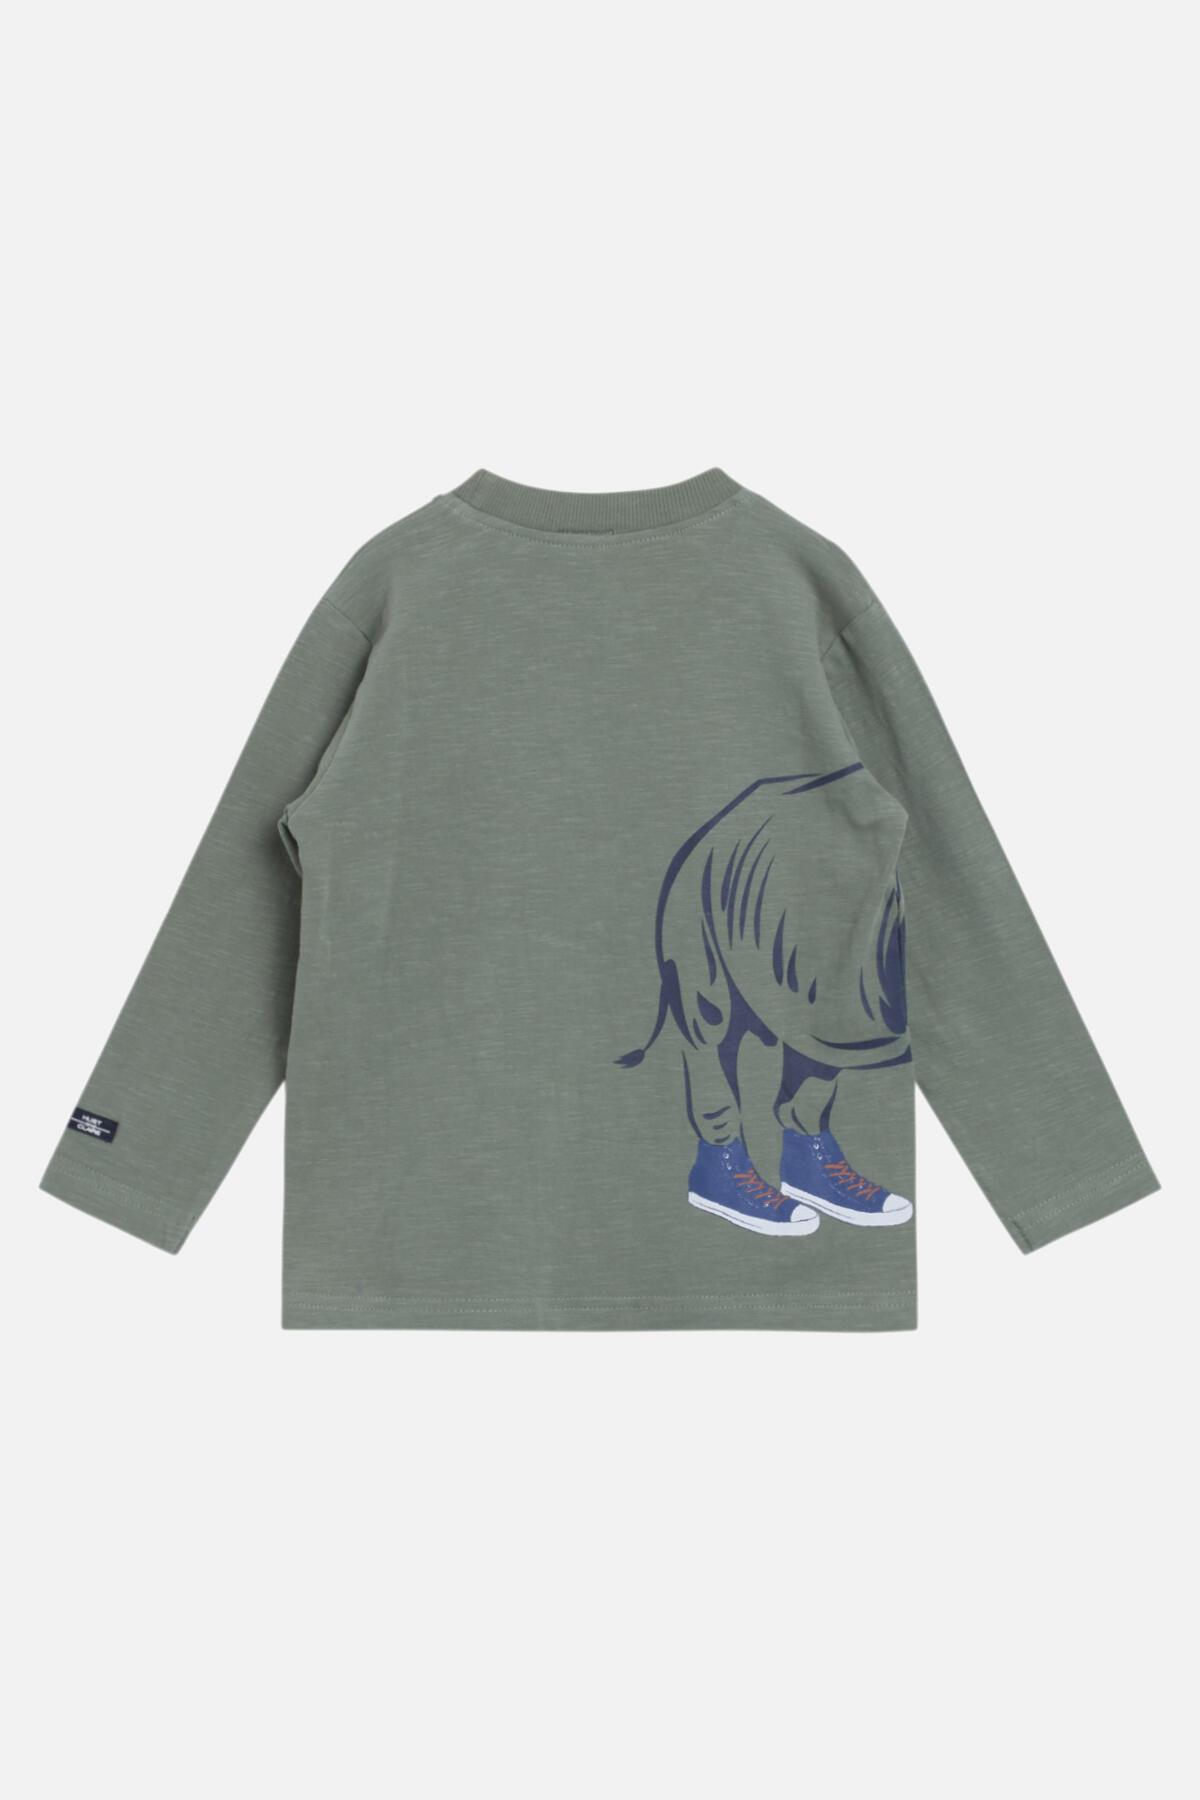 Boy - Anton - T-shirt